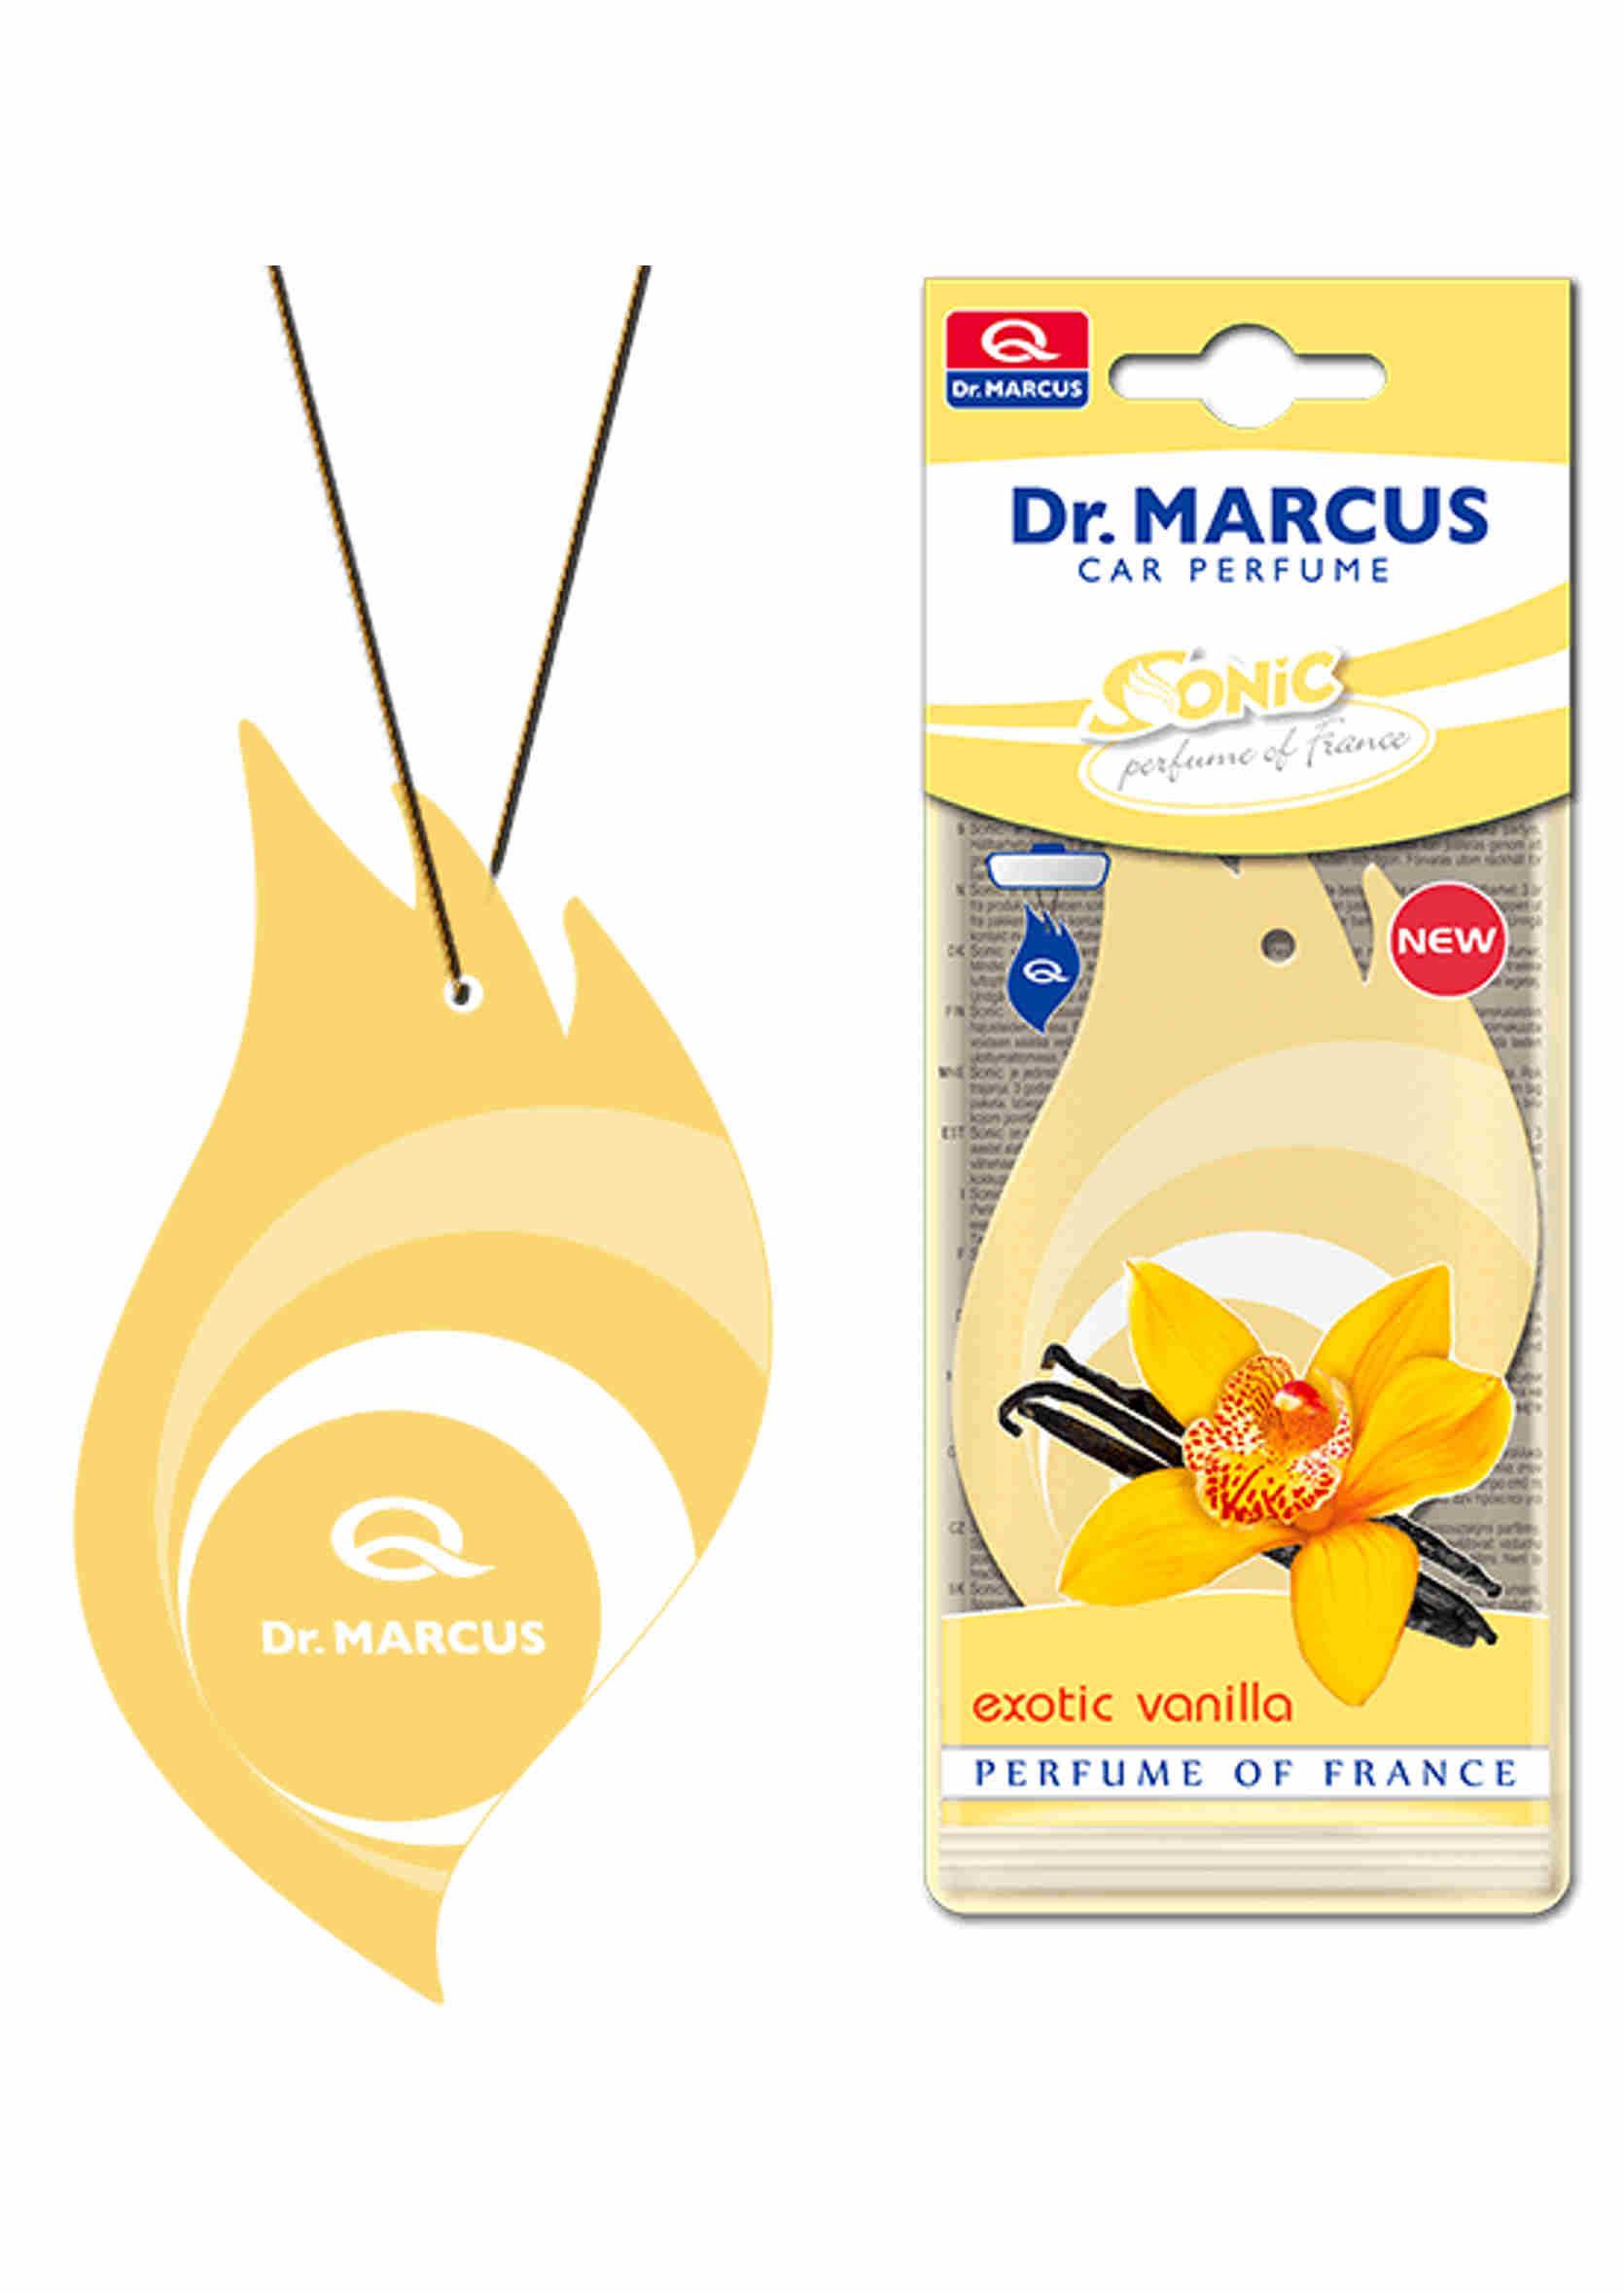 Dr. Marcus Sonic Exotic Vanilla Listek Zapachowy Choinka Wanilia